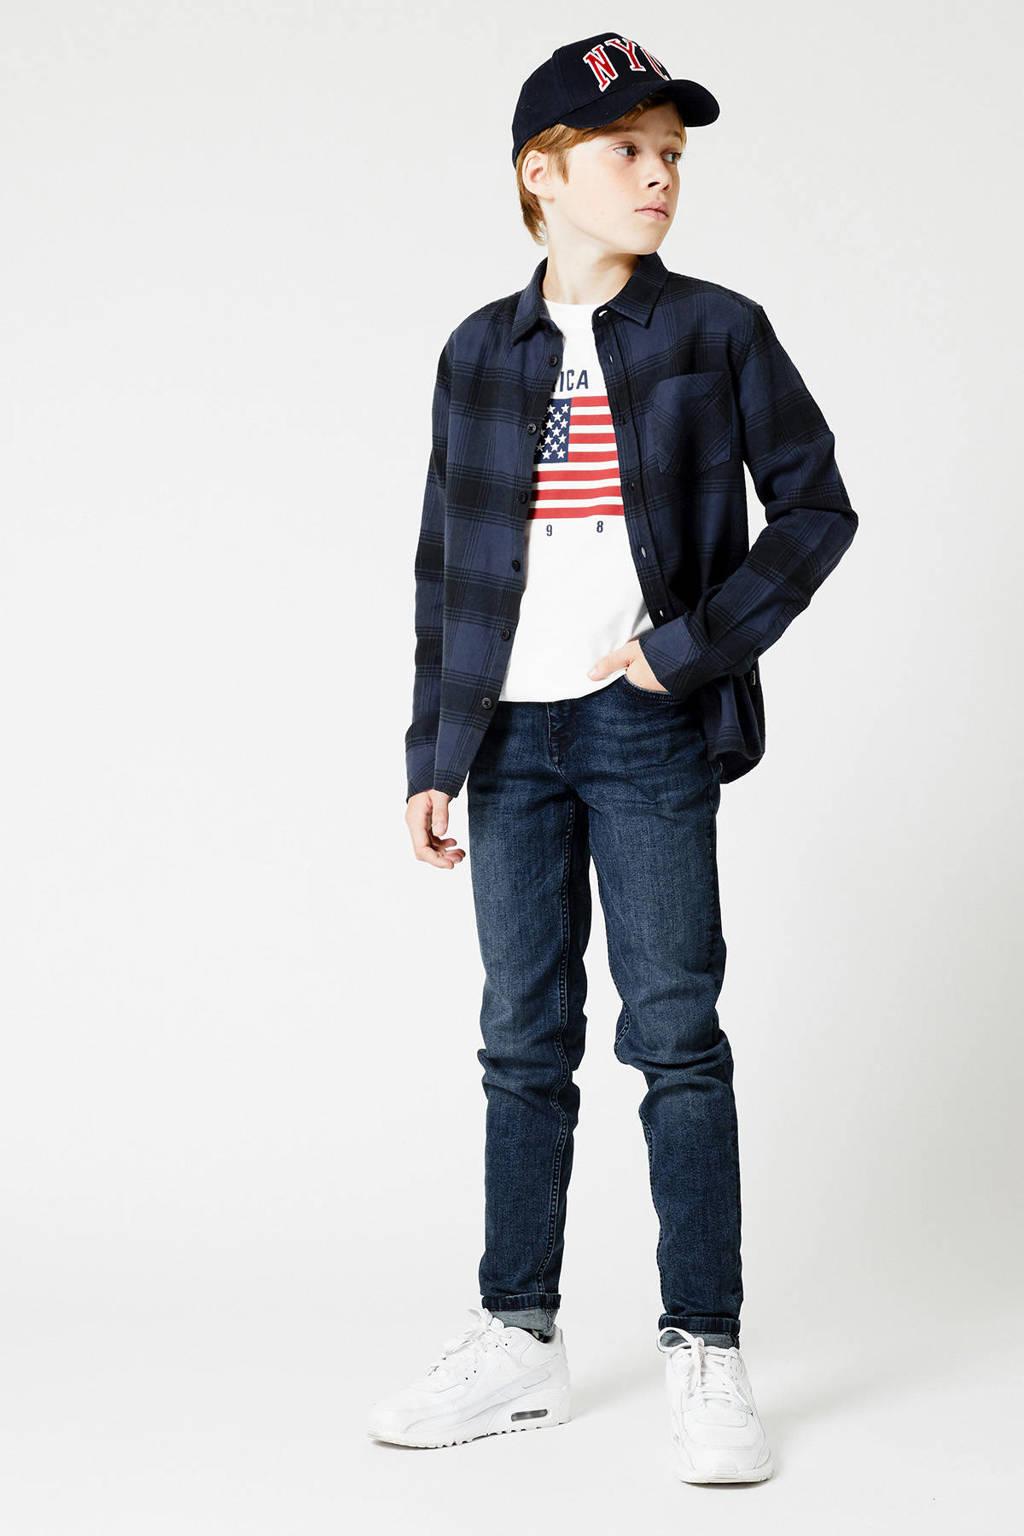 America Today Junior geruite overhemd Hector donkerblauw, Donkerblauw